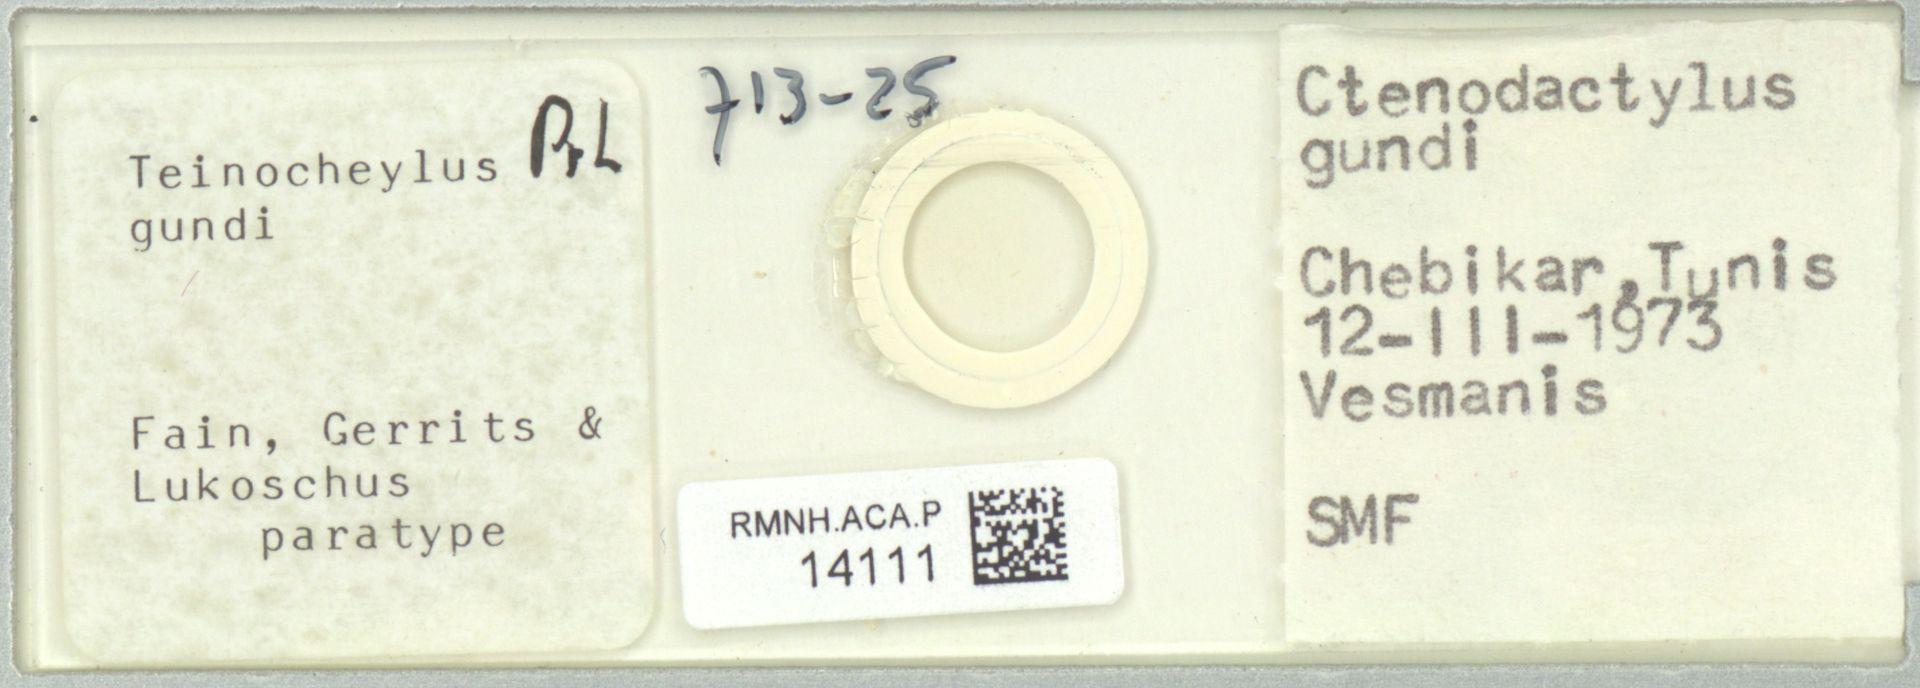 RMNH.ACA.P.14111   Teinocheylus gundi Fain, Gerrits & Lukoschus